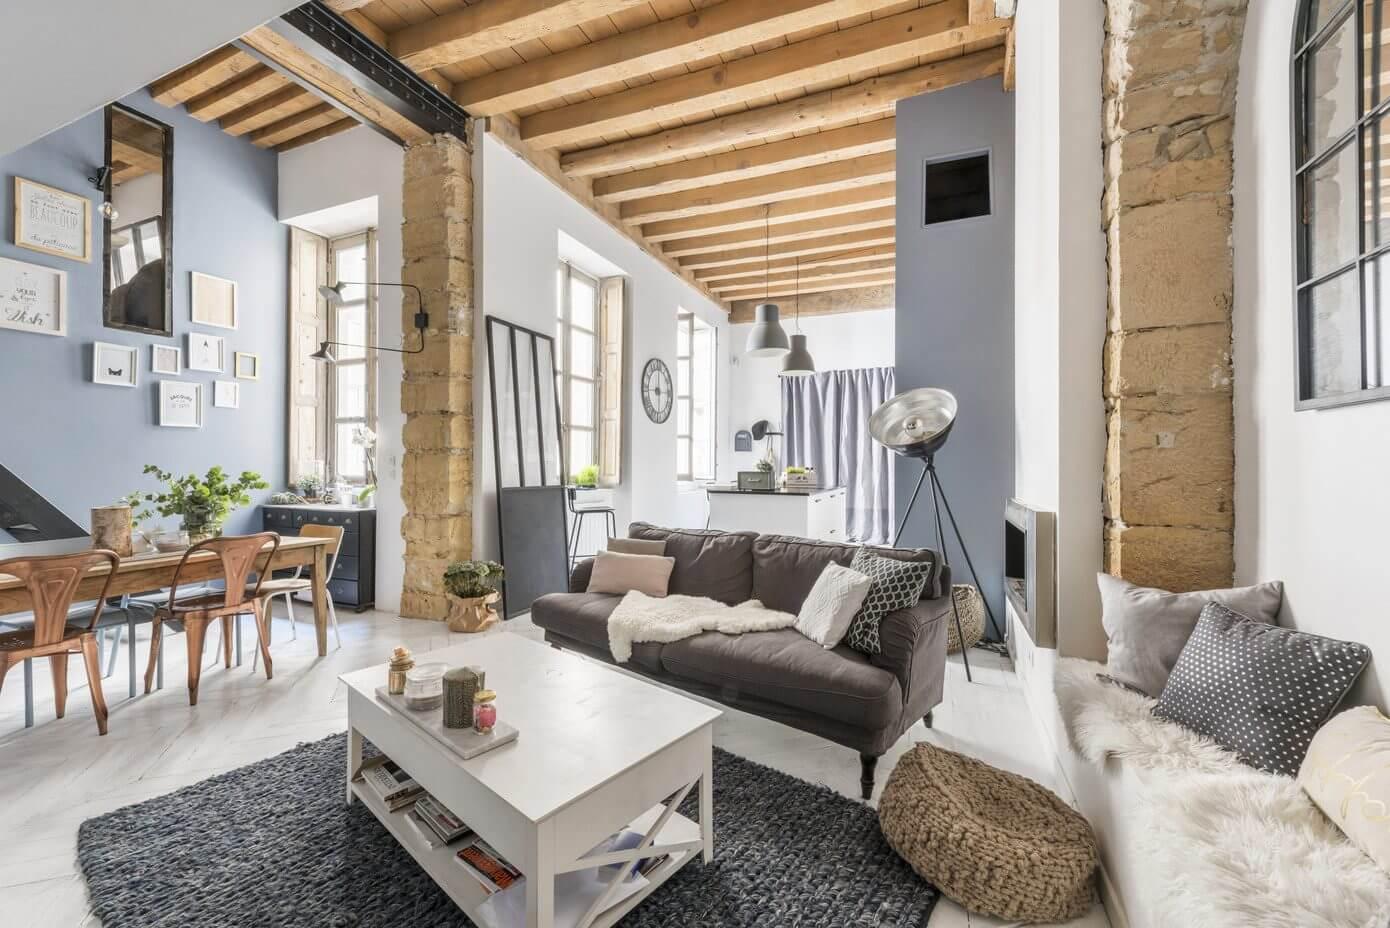 Apartment in lyon by espaces atypiques homeadore for Espace atypique loft